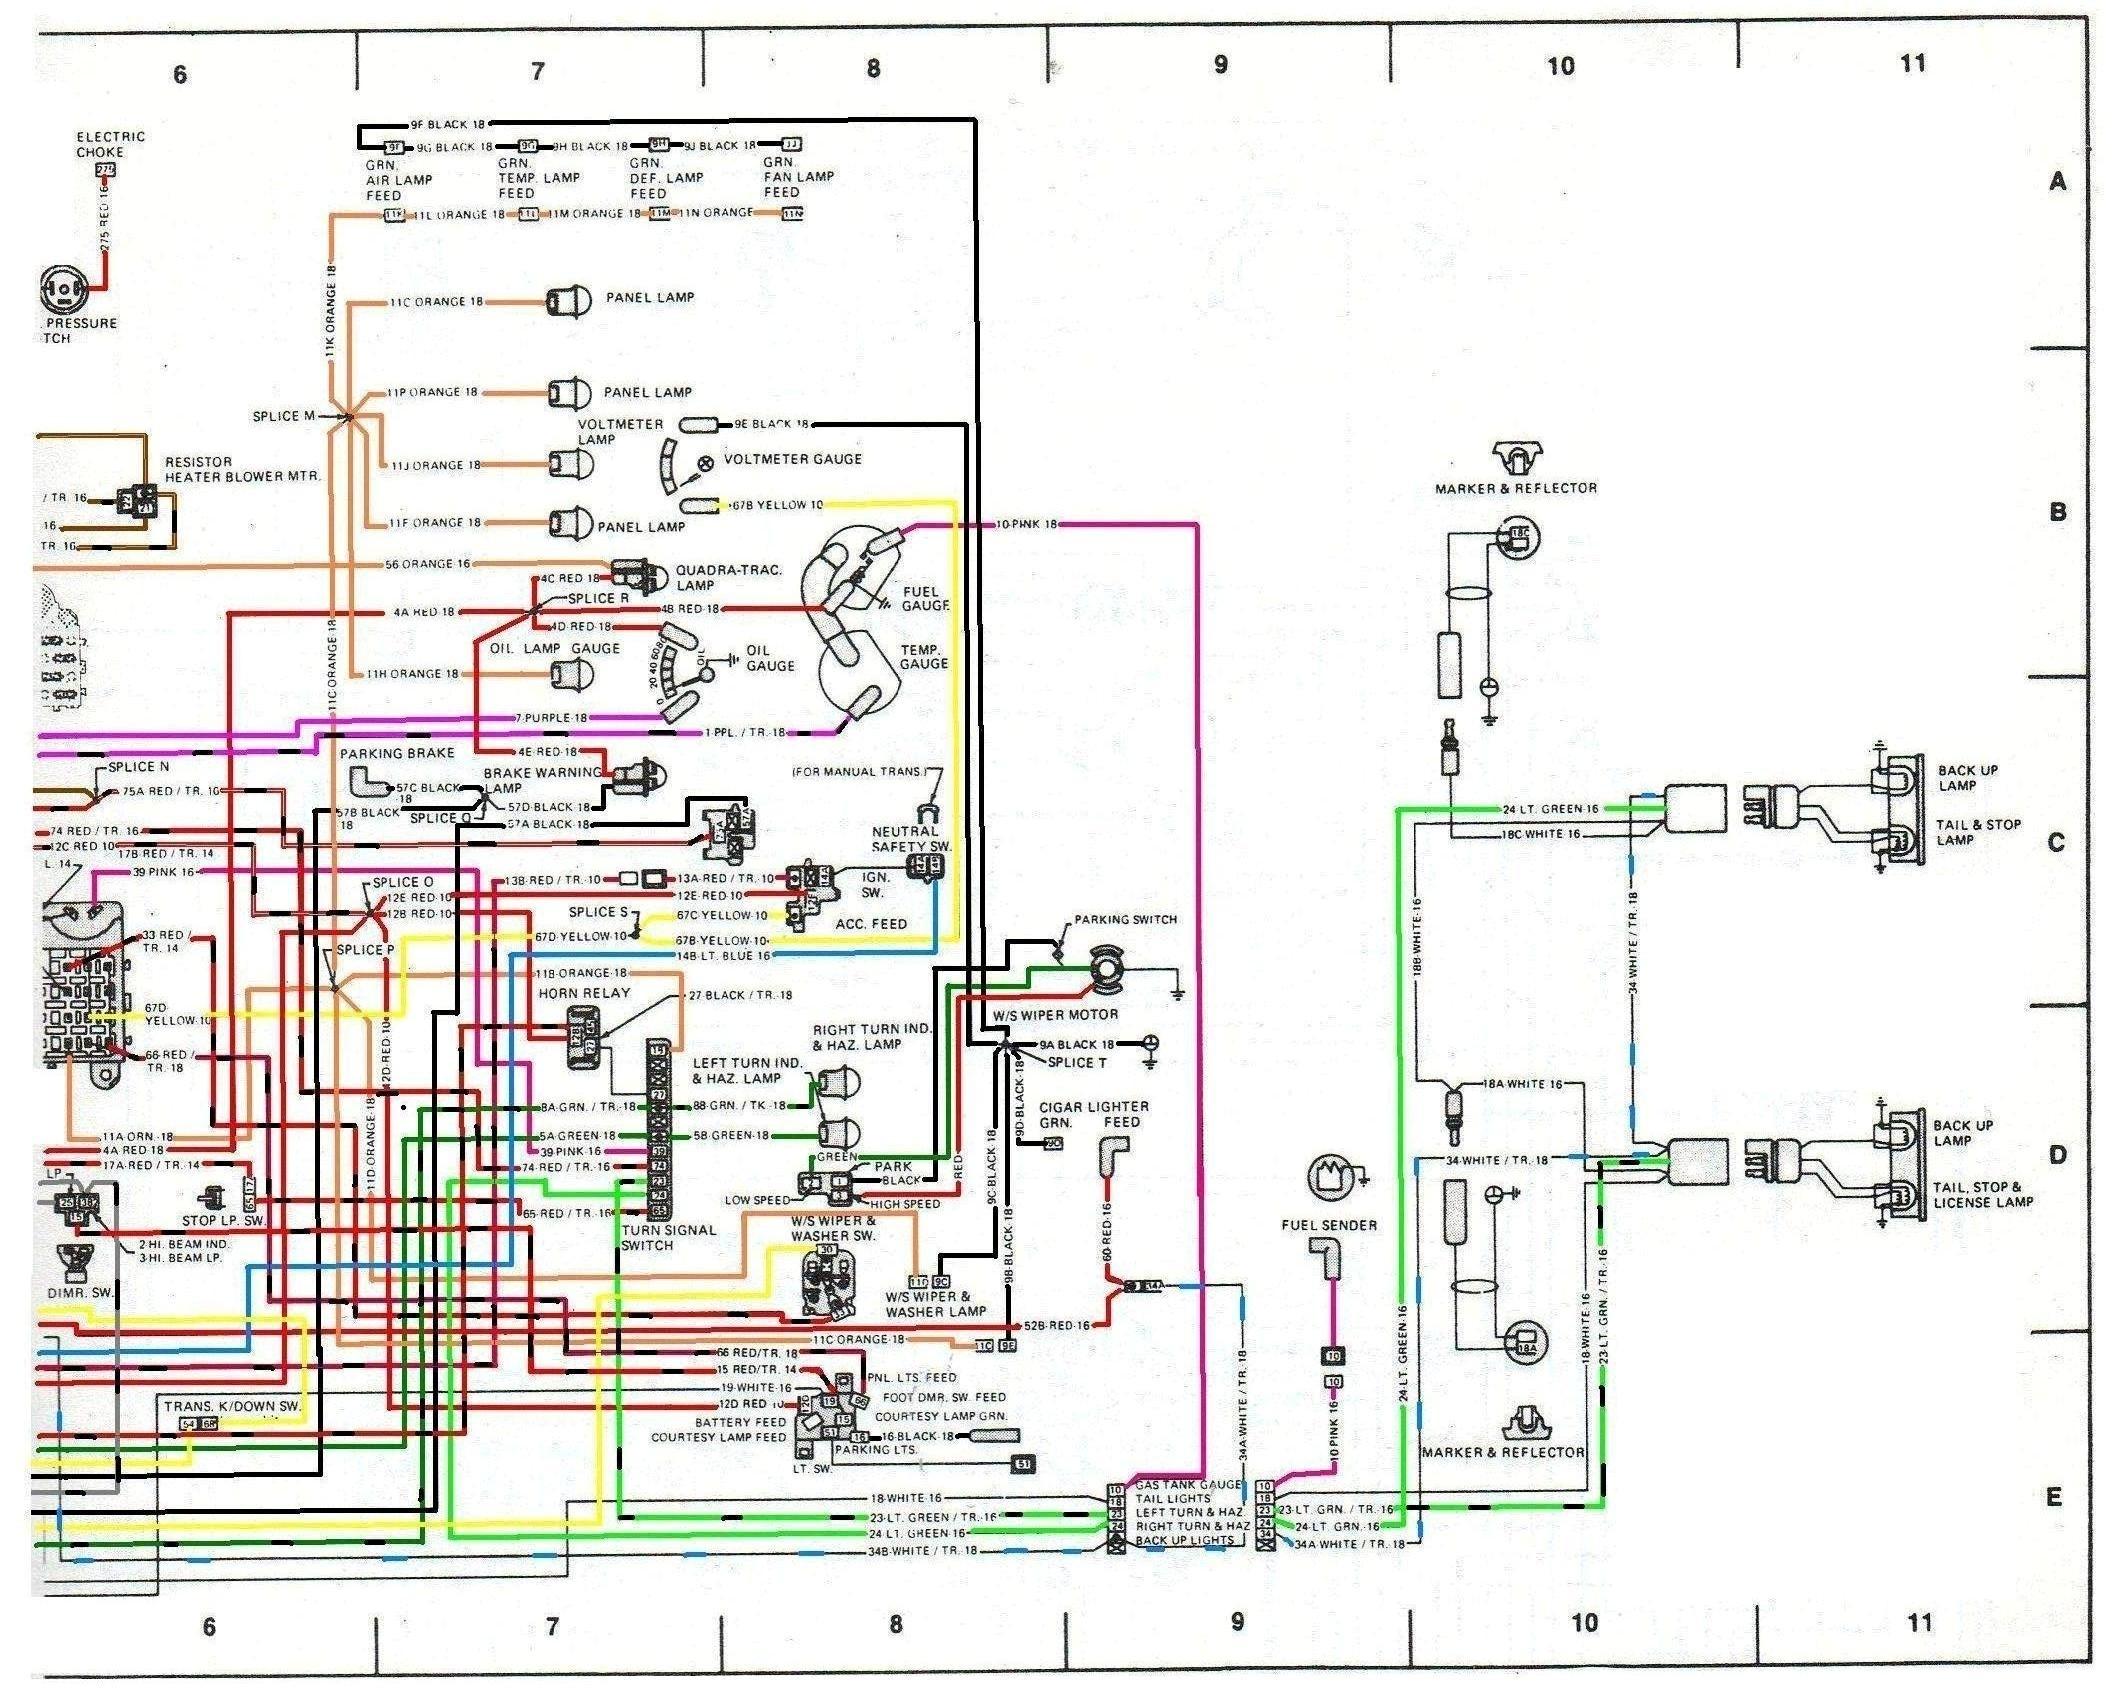 Cj7 Electric Choke Wiring Diagram Cb50 Wiring Diagram Bege Wiring Diagram